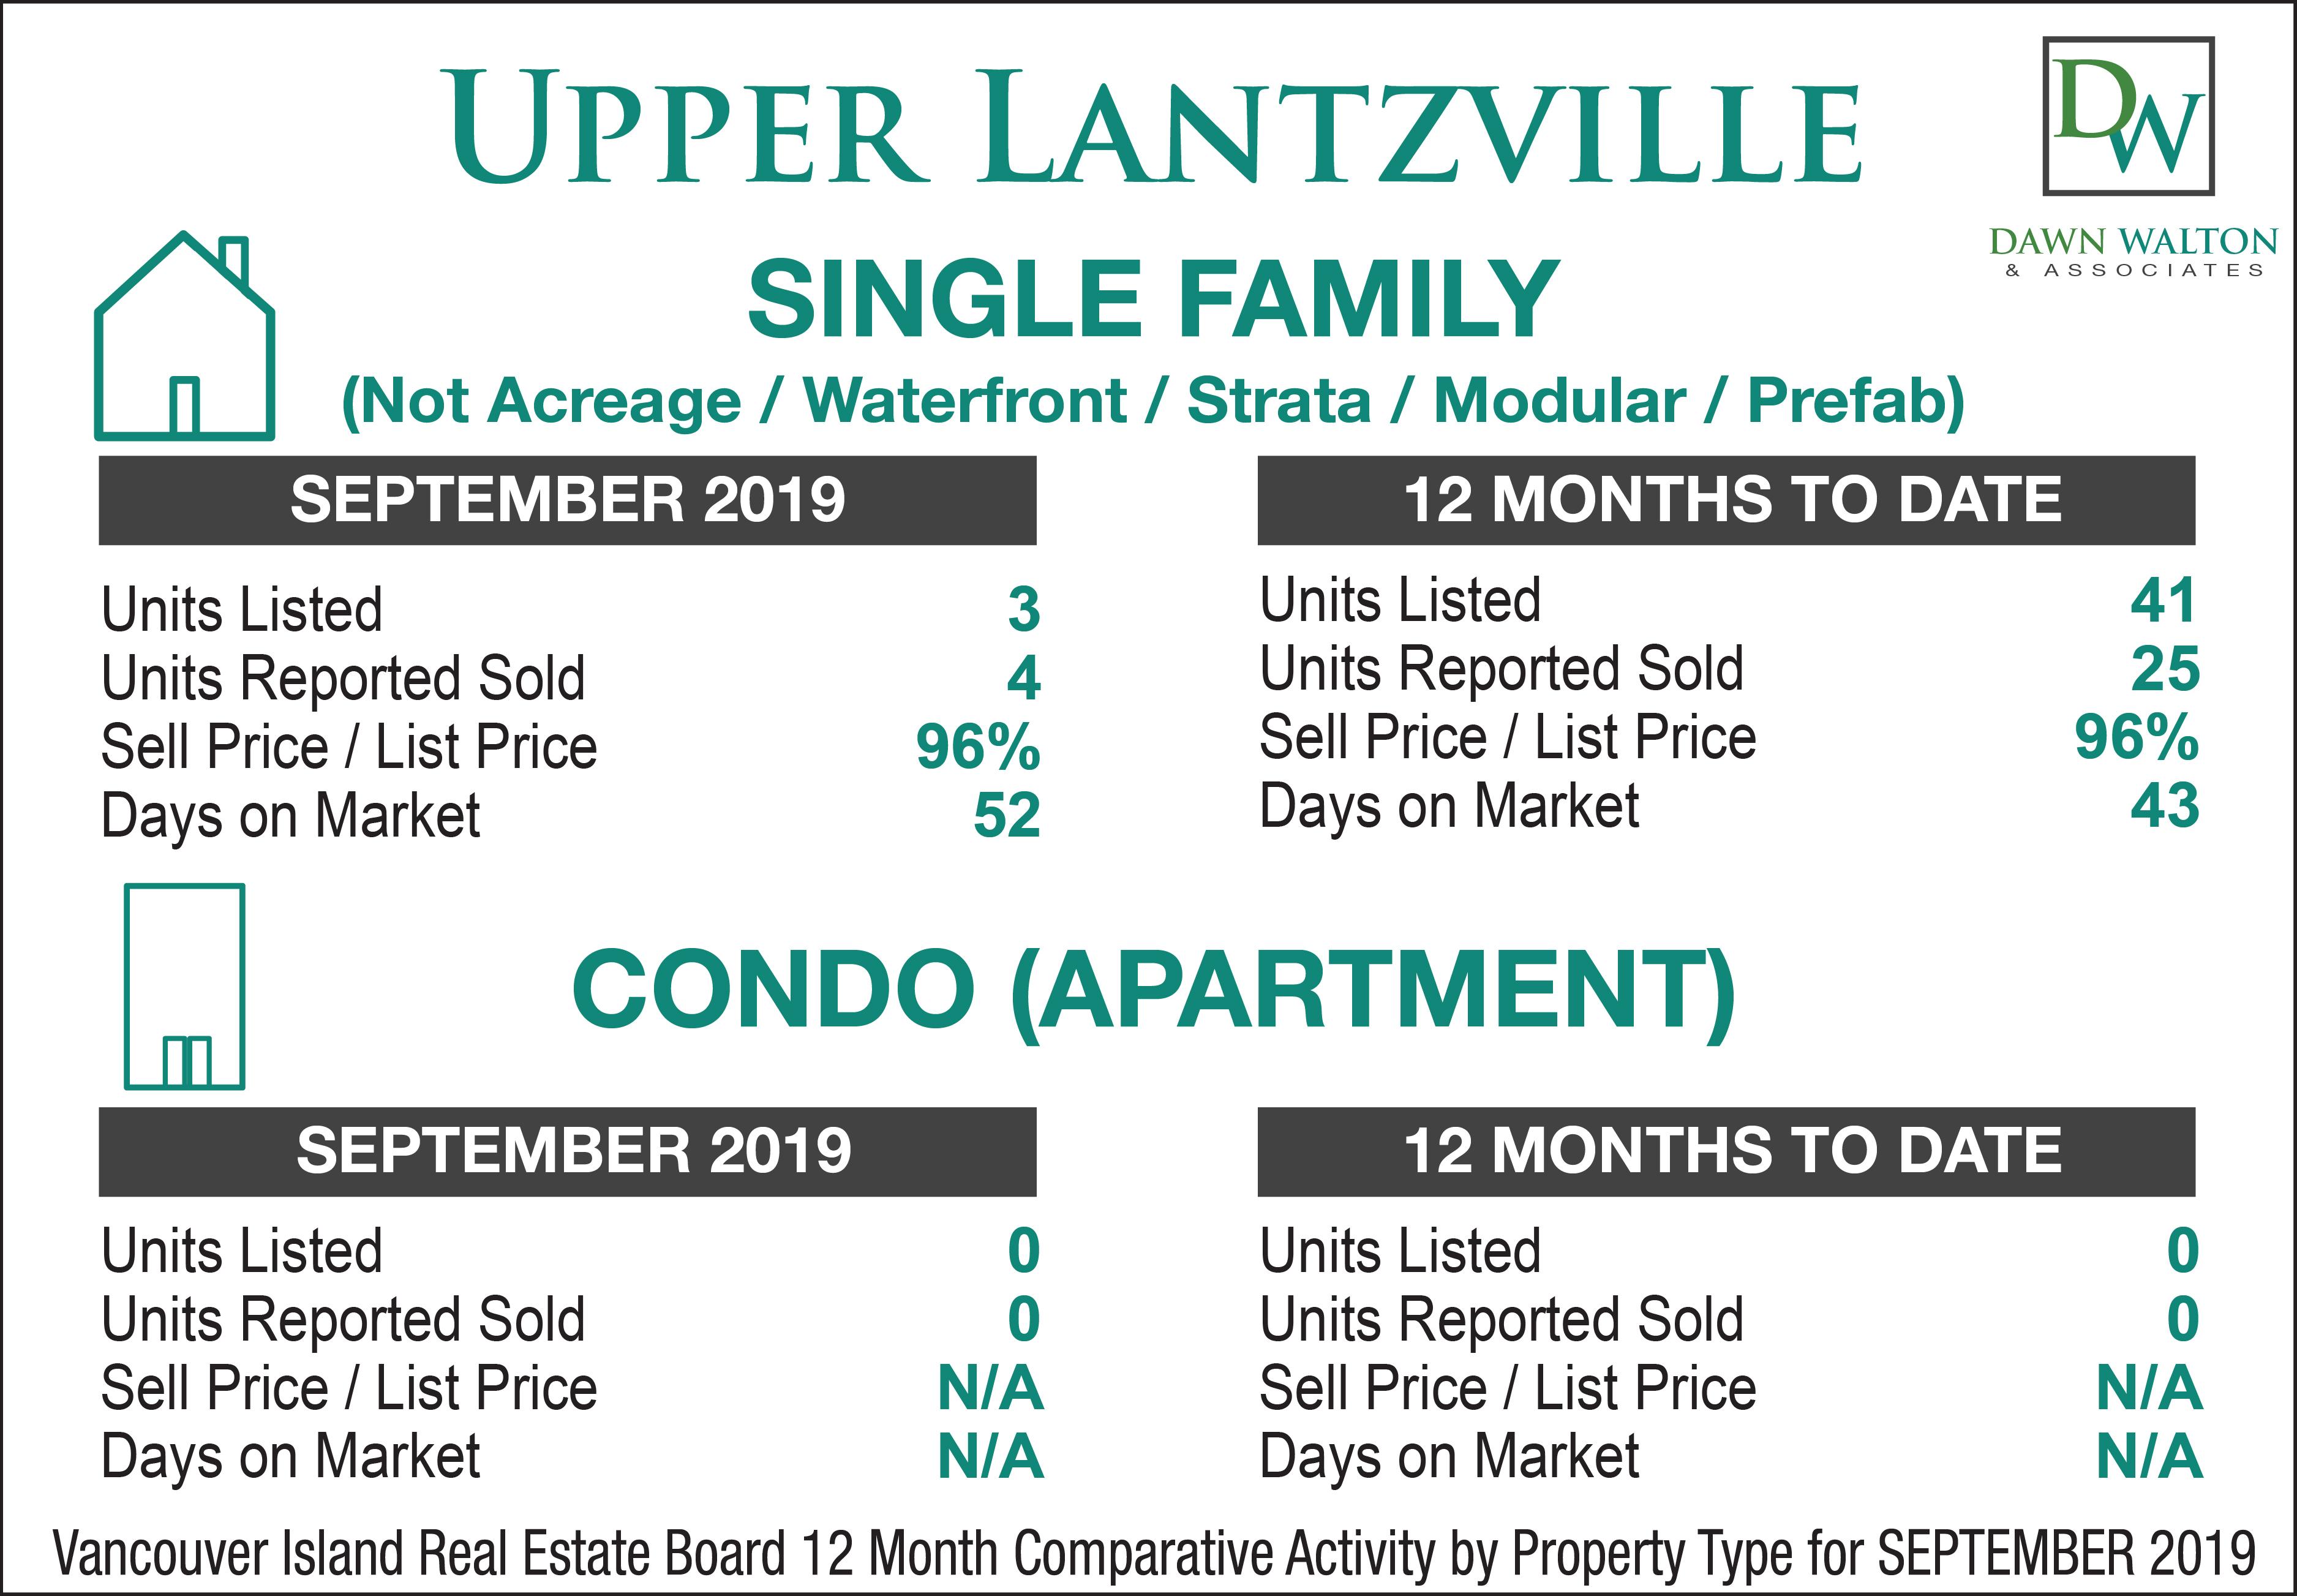 Upper Lantzville Real Estate Market Stats September 2019 - Nanaimo Realtor Dawn Walton